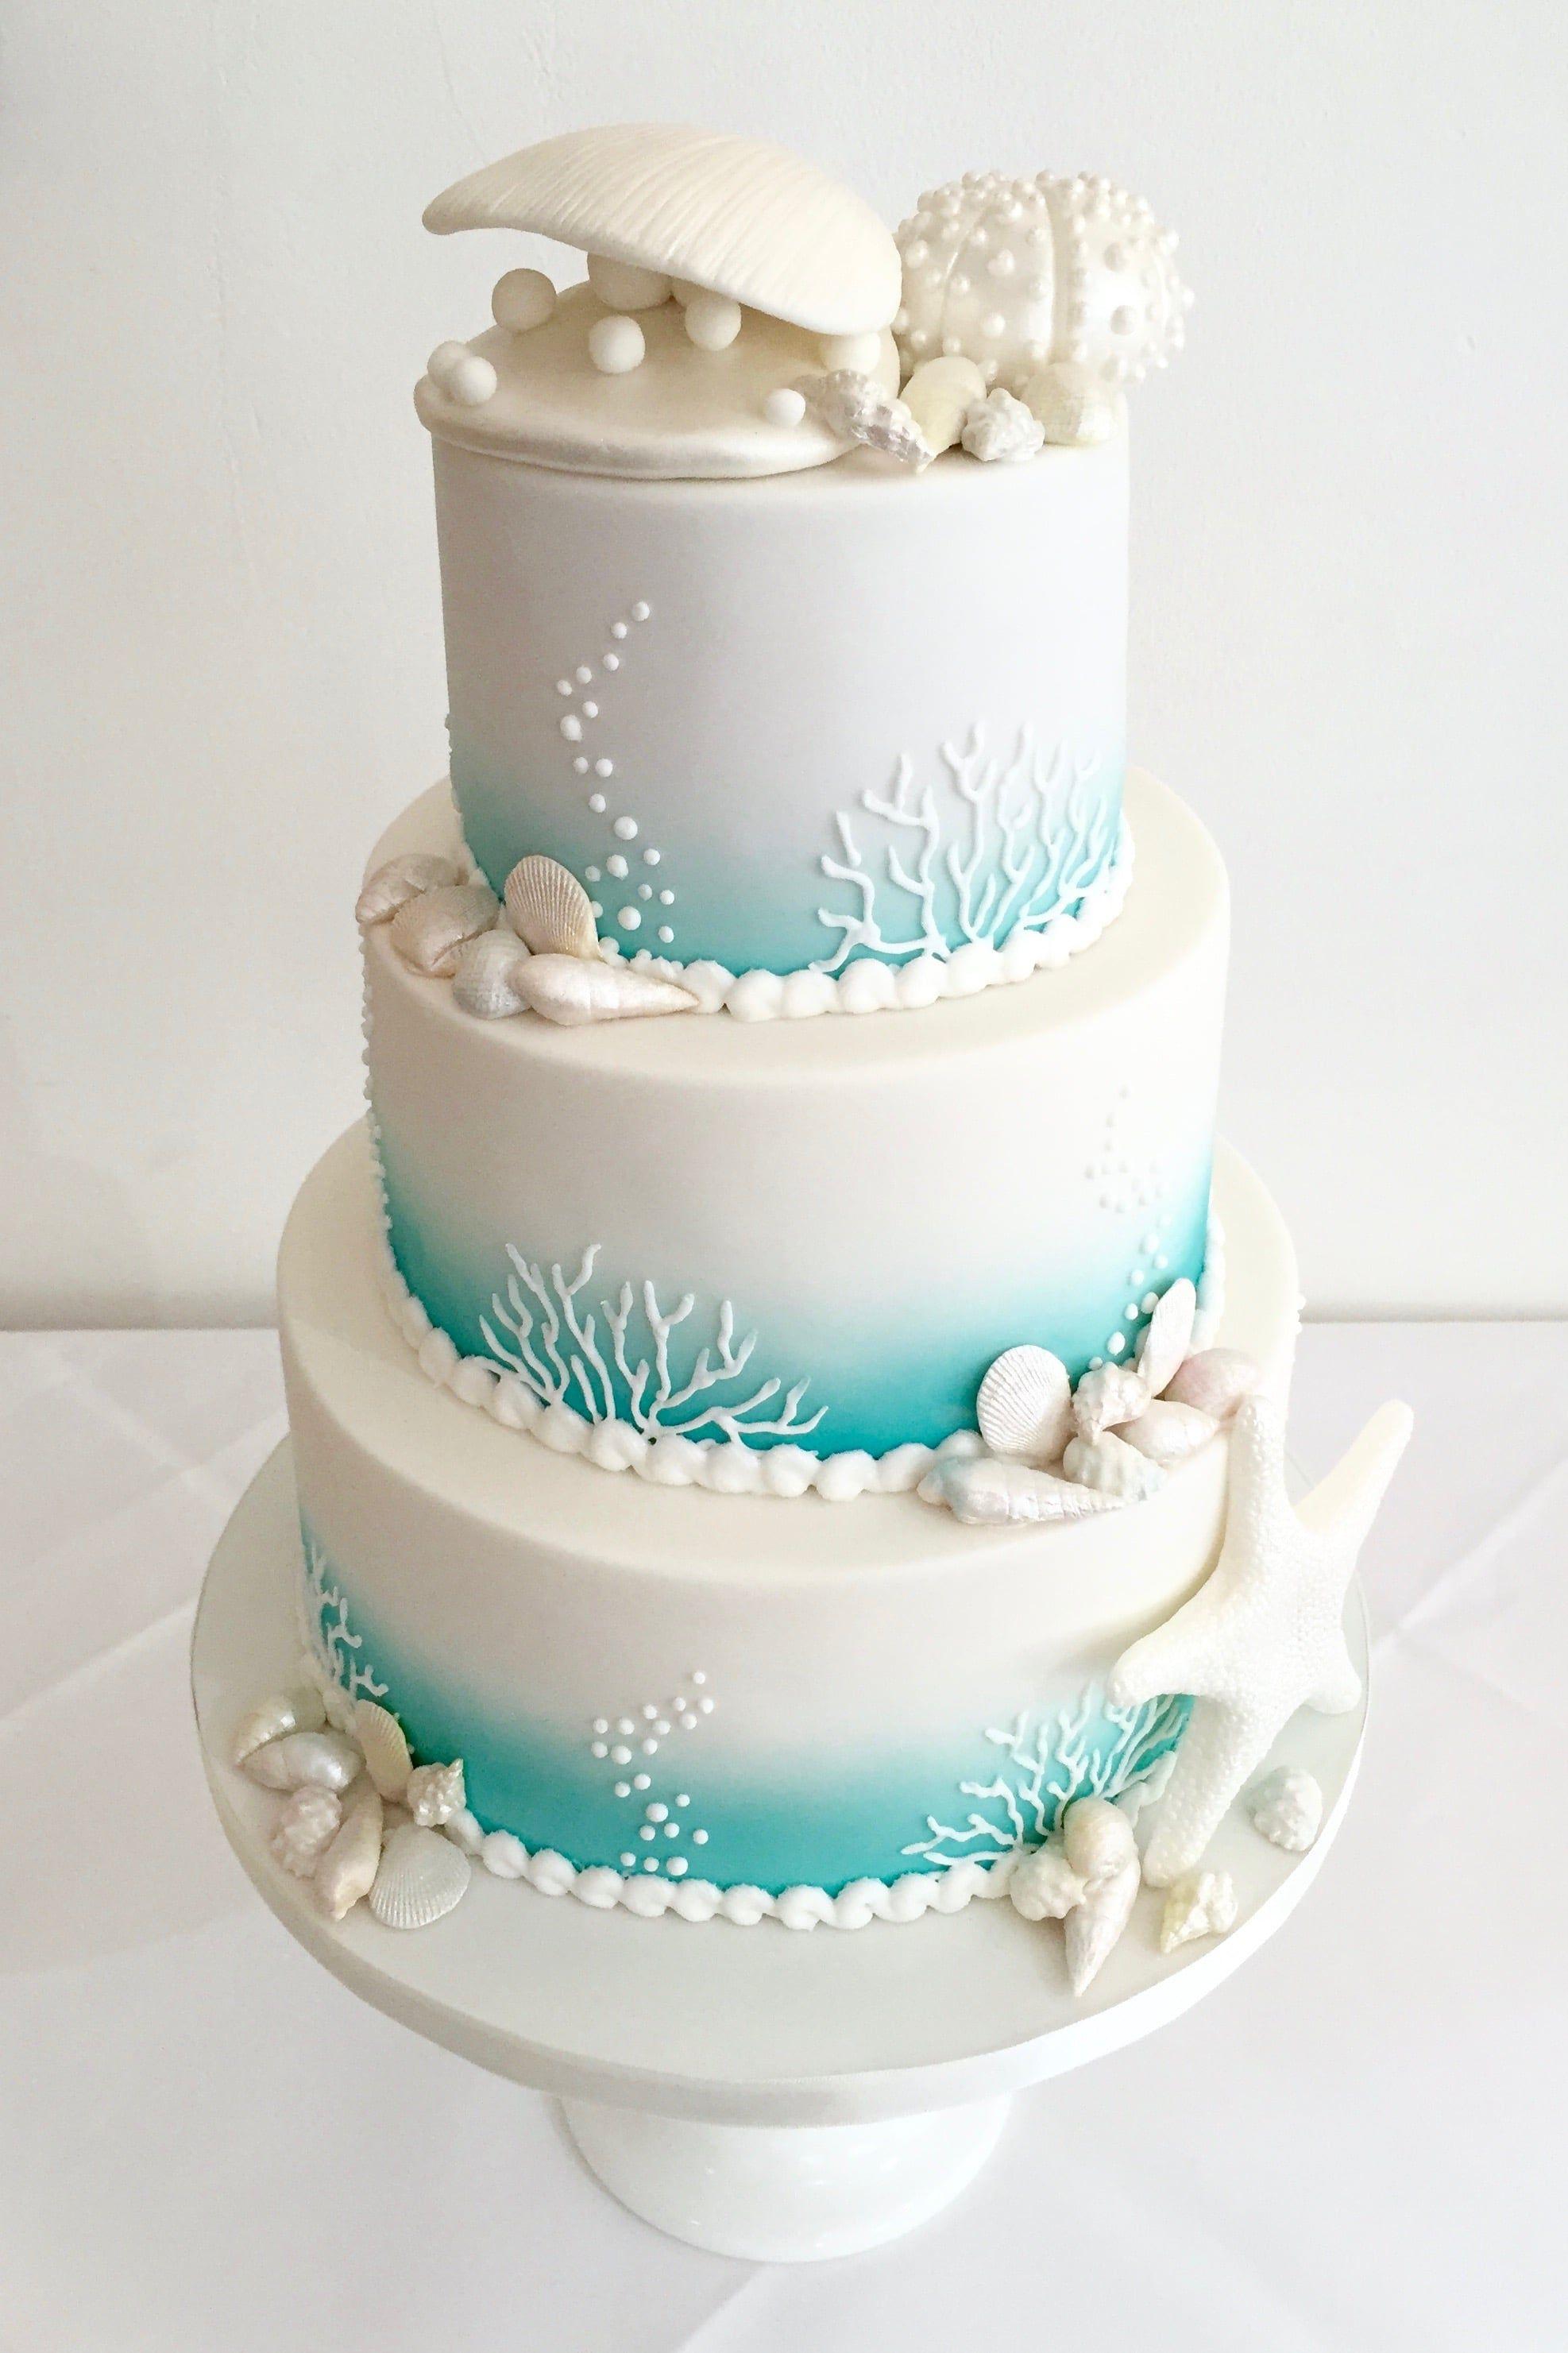 Beach Wedding Cake - Sweetie Darling Cakes | Cake Shop | Pinterest ...